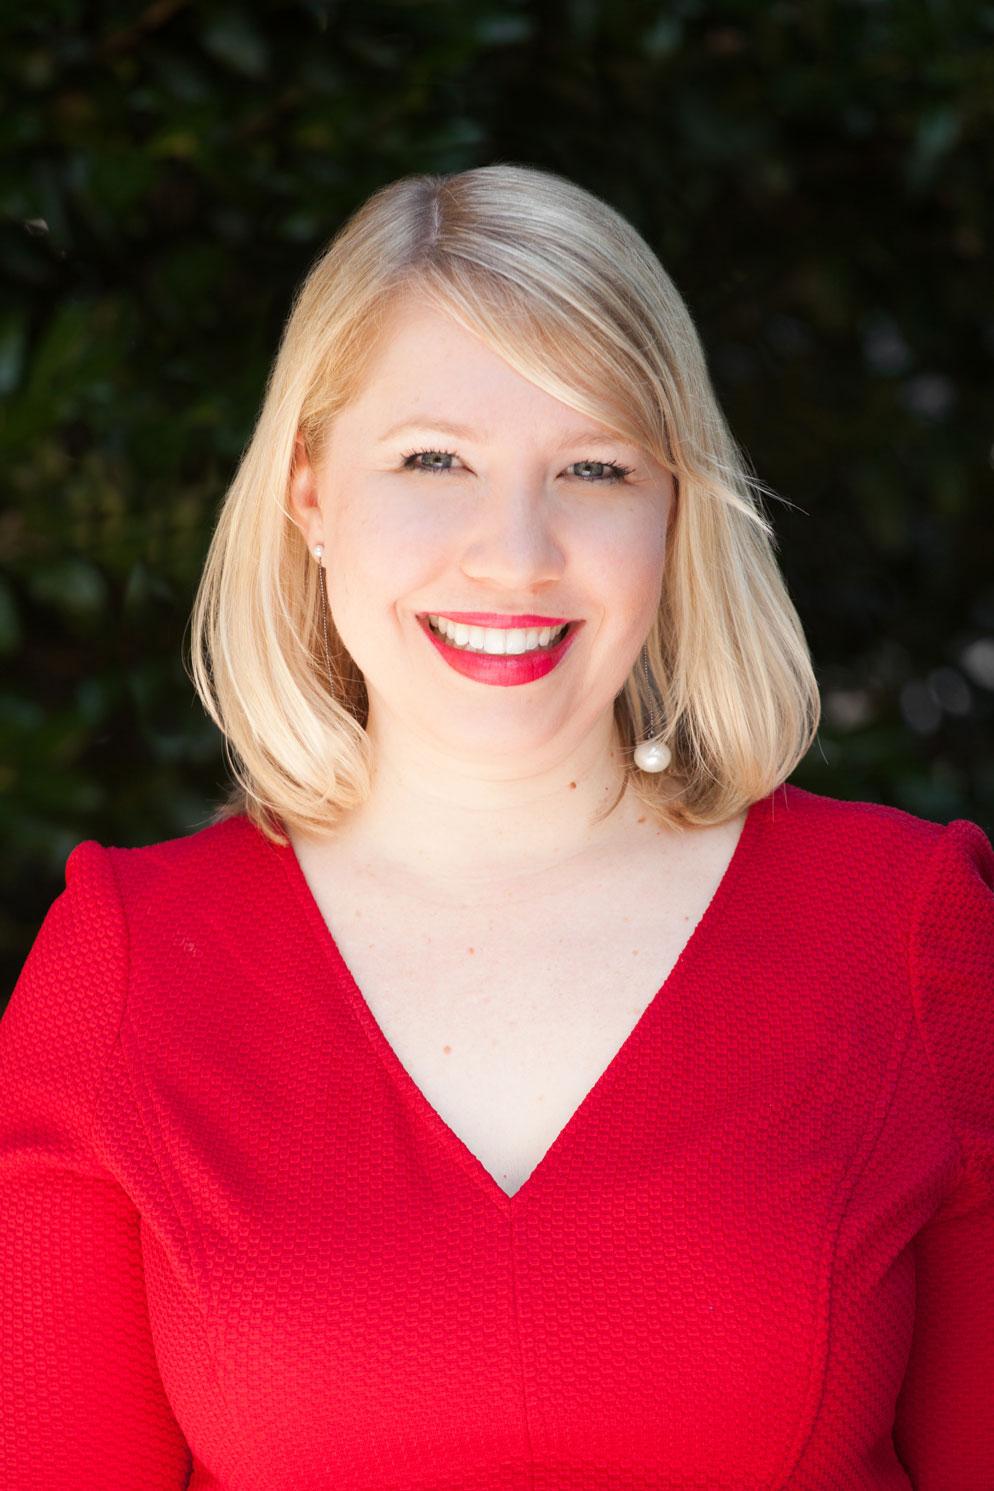 Photo of Lindsay Hardin, Corporate